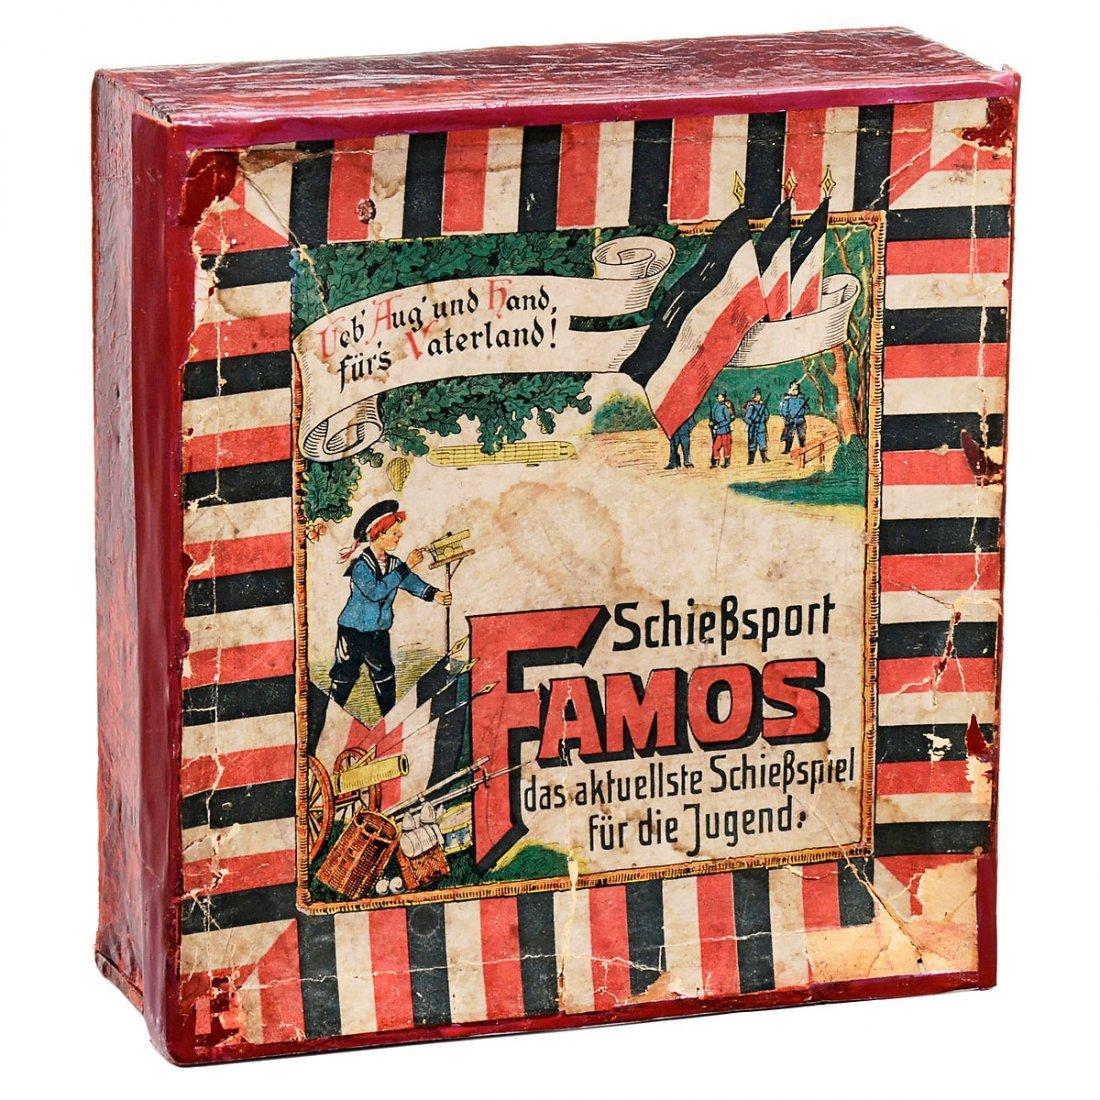 Famos Boxed Shooting Game, c. 1908 - 2